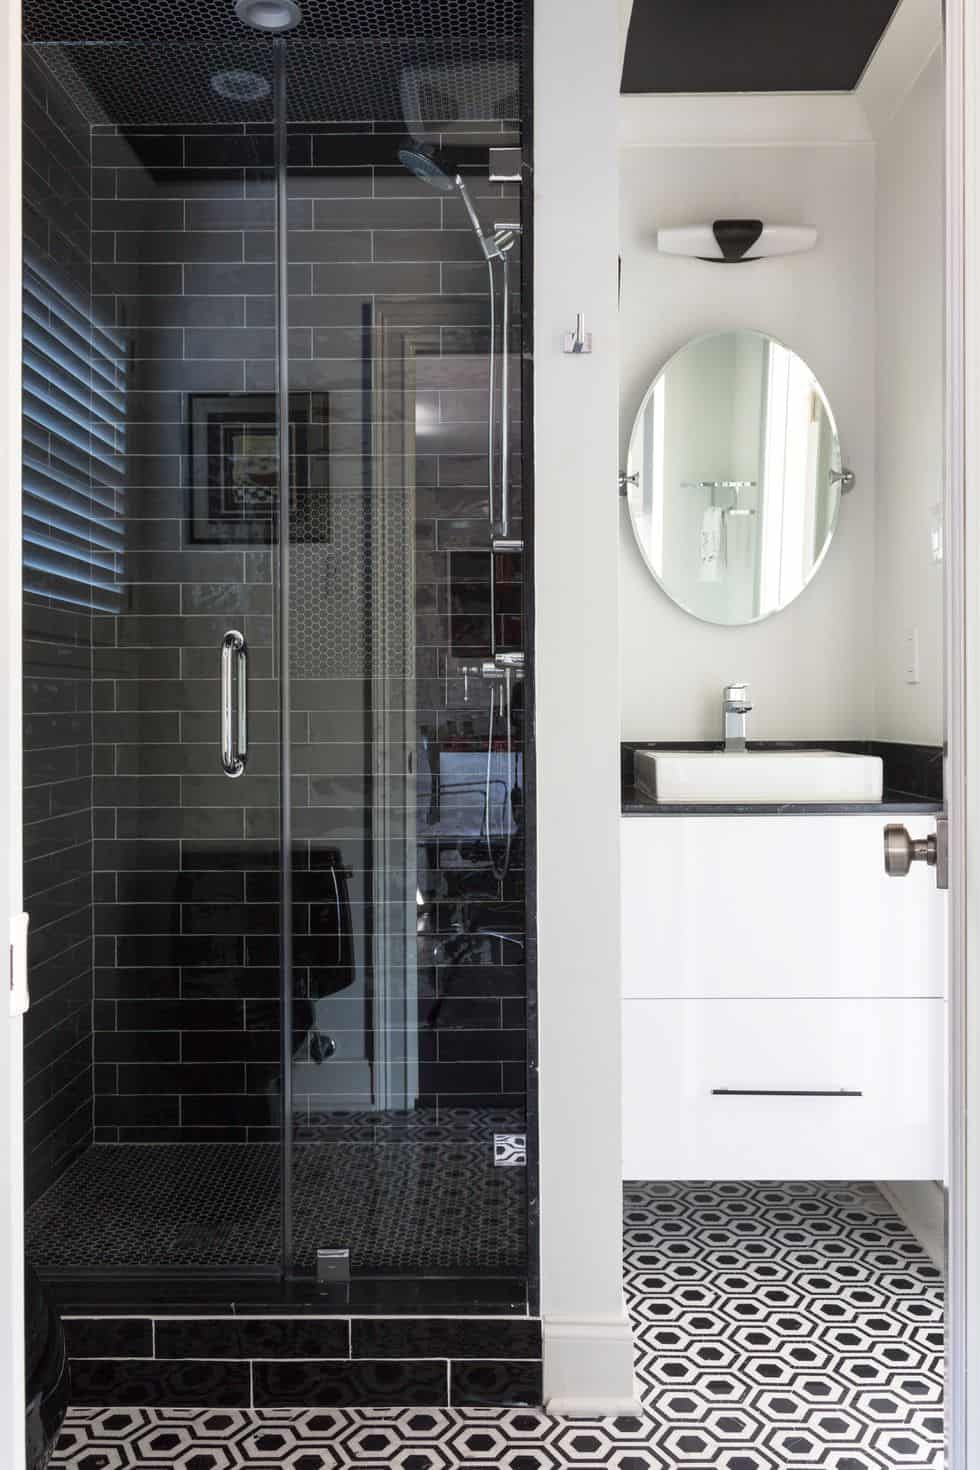 22 Walk In Shower Ideas Trendy And Inspiring Bathroom Design Bathroom Shower Design Shower Room Design Ideas